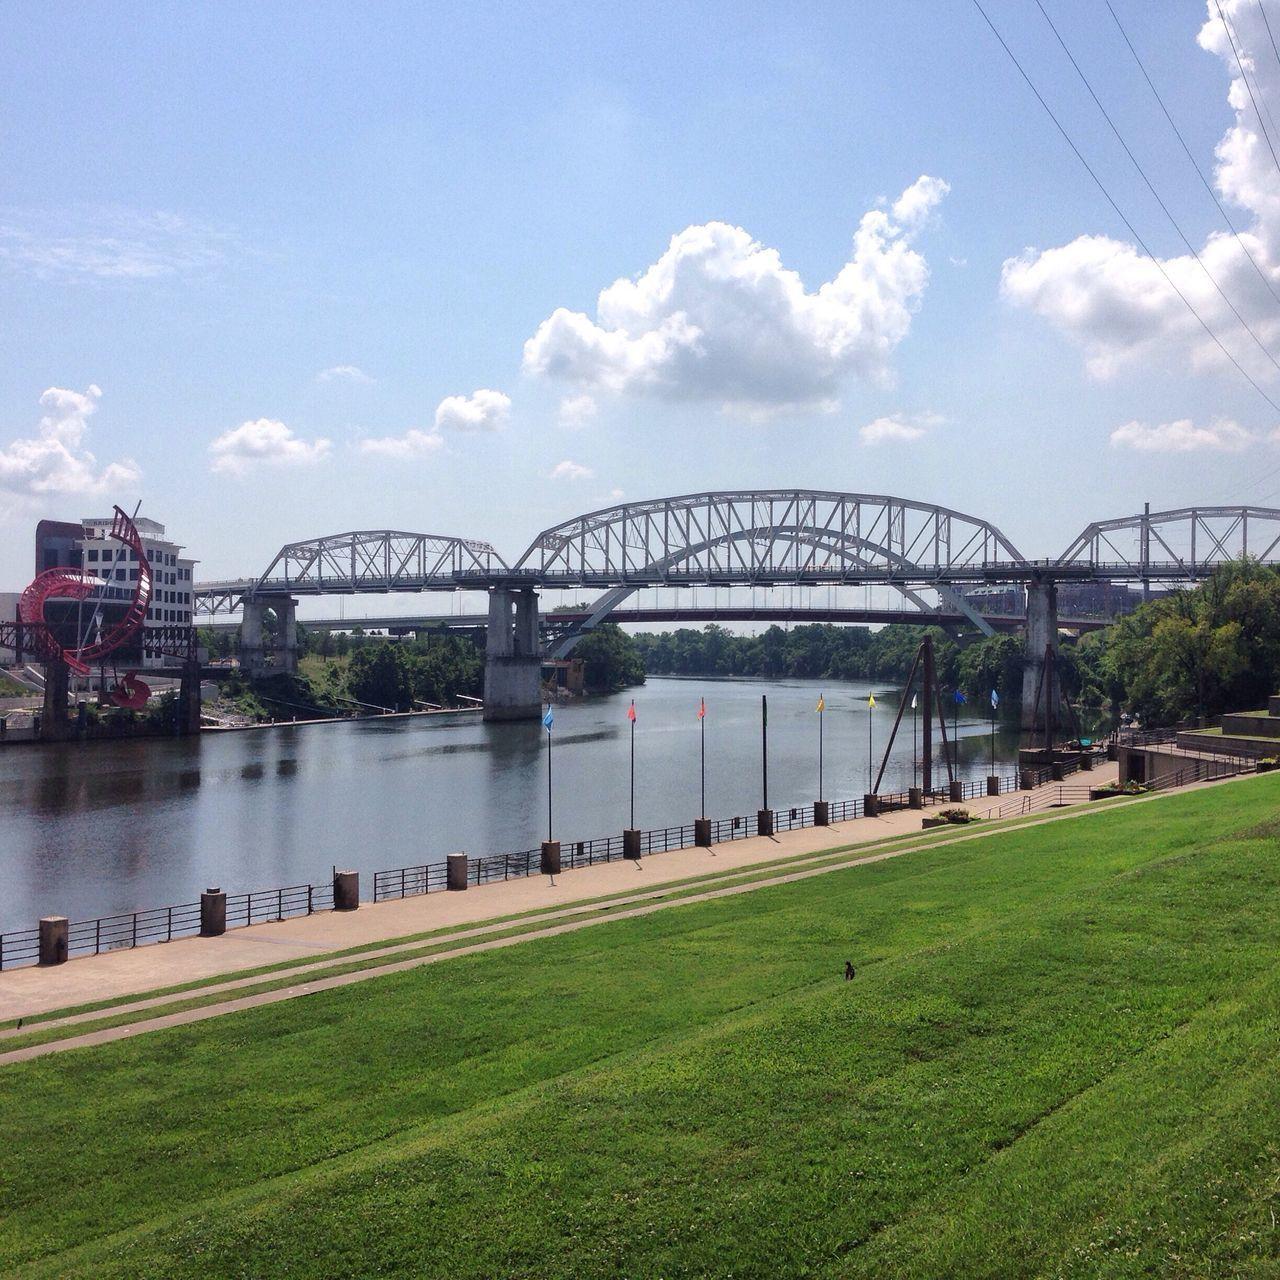 Nashville Riverfront!